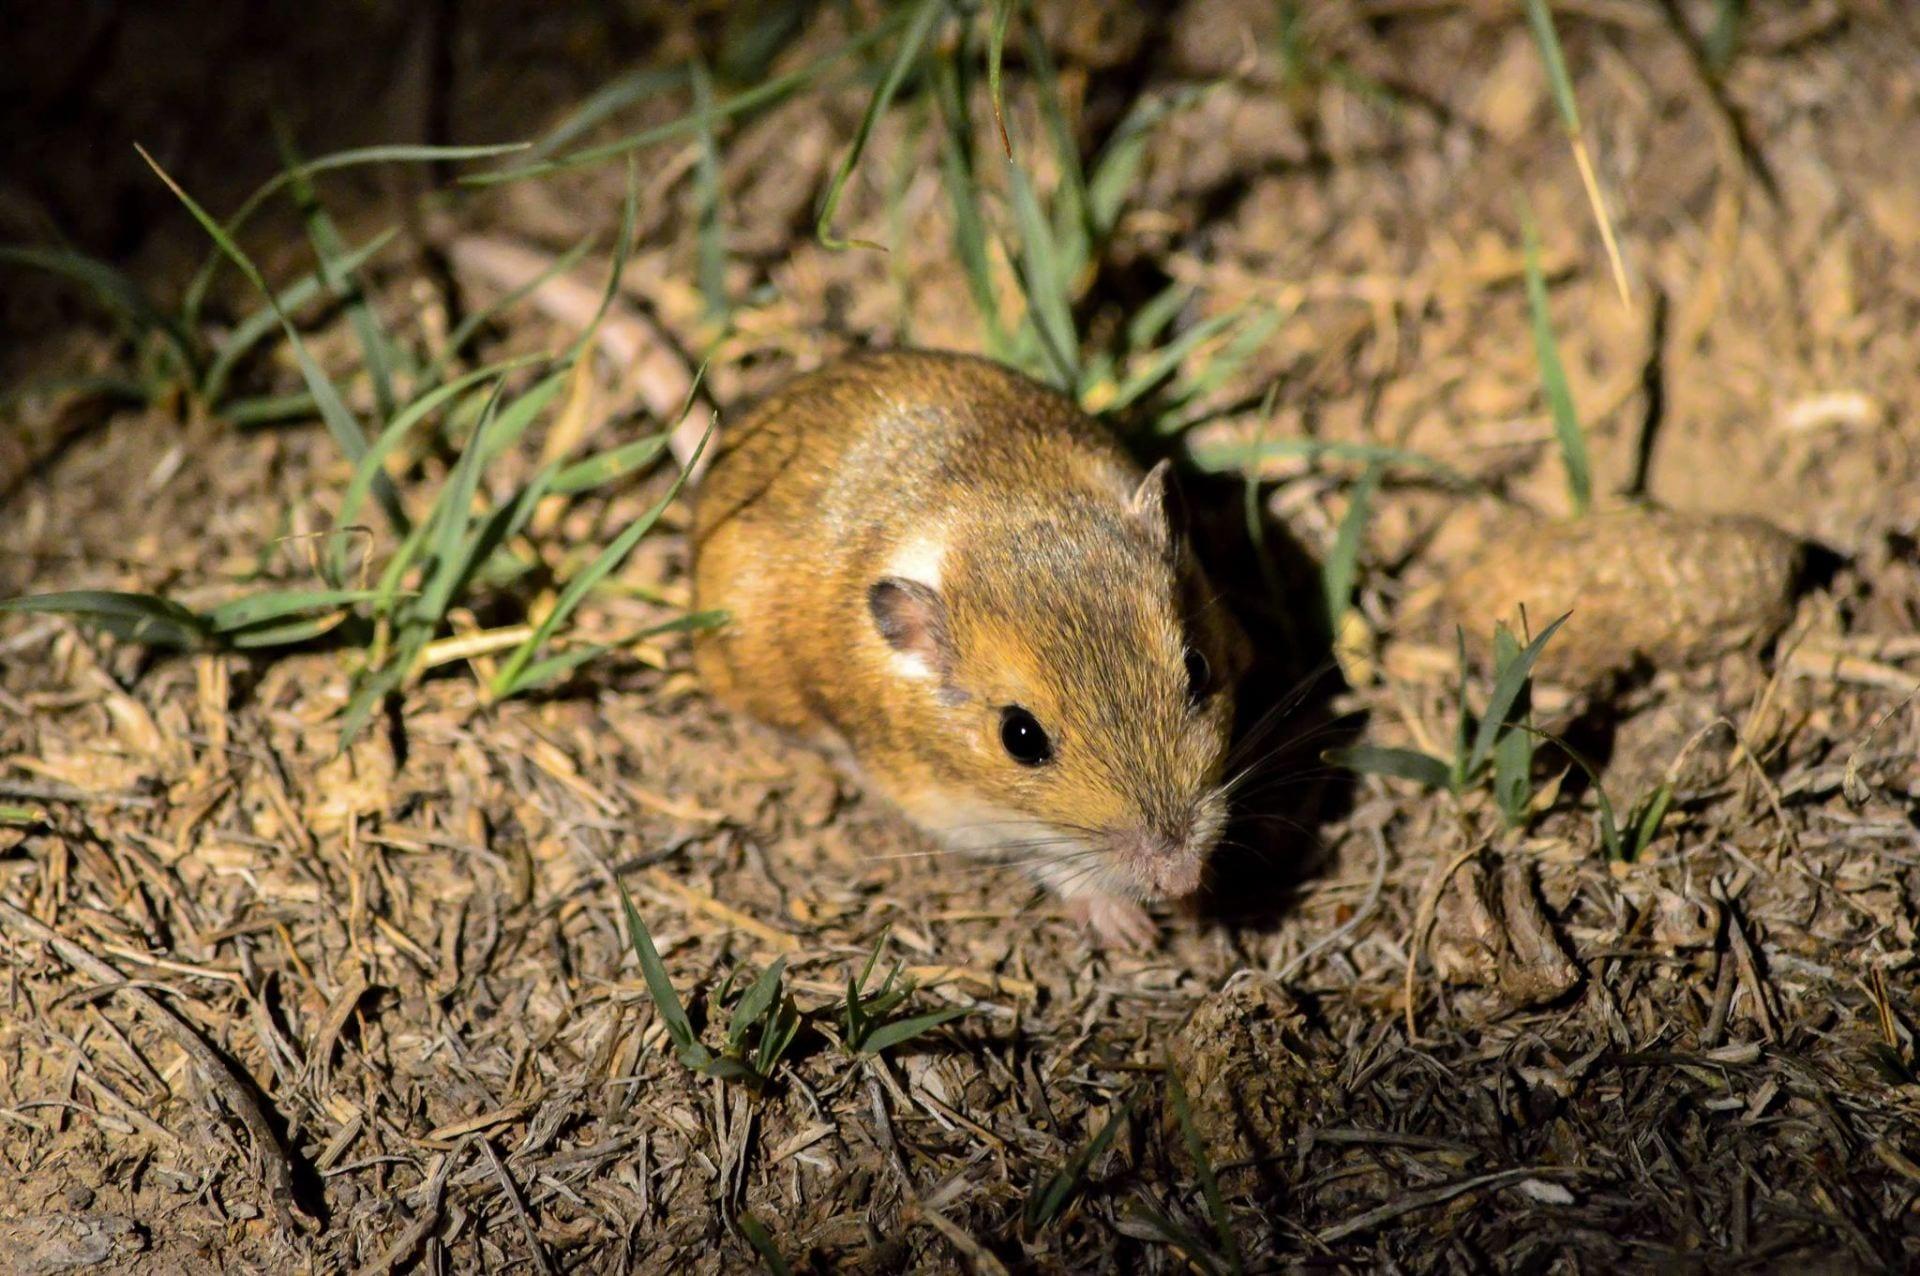 Photograph of a silky pocket mouse (Perognathus flavus)